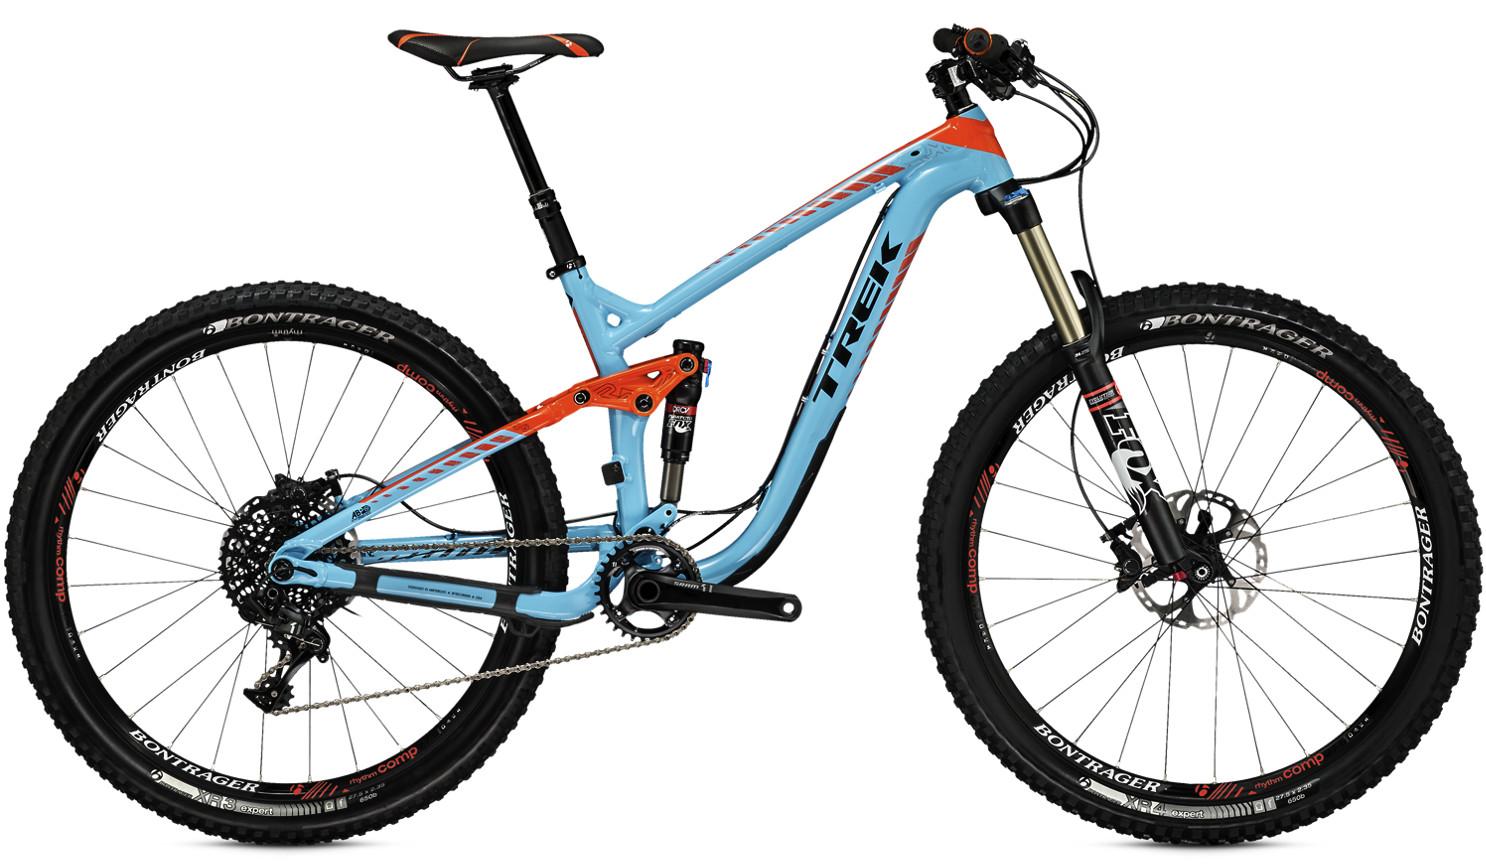 2015 trek remedy 9 27 5 bike reviews comparisons specs. Black Bedroom Furniture Sets. Home Design Ideas